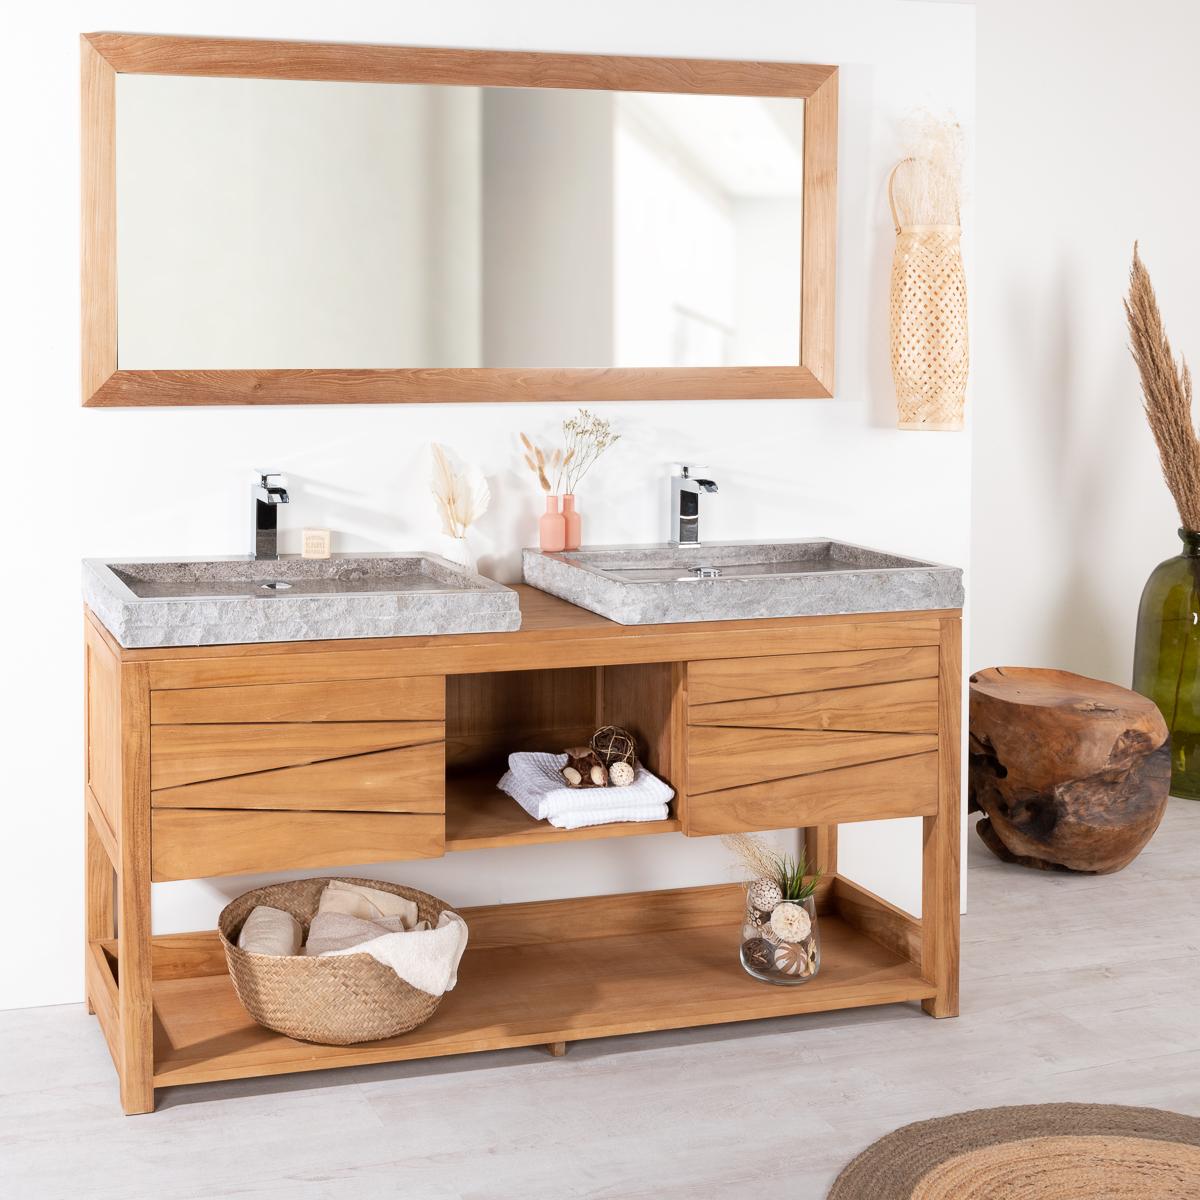 Meuble double en teck massif cosy 160cm 2 vasques gris - Meuble salle de bain teck design ...